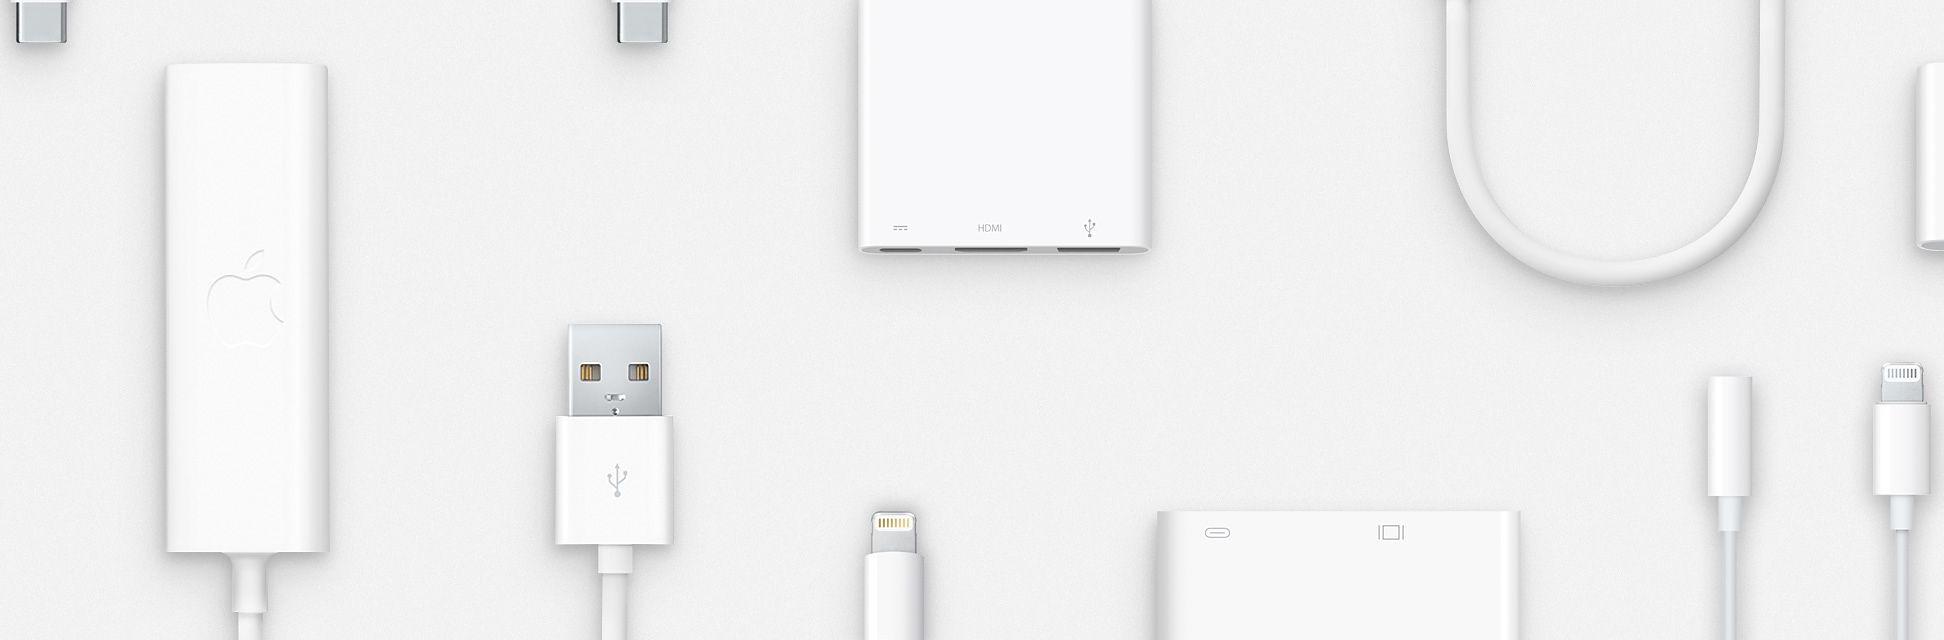 MacBook Pro 2016 accessori e adattatori Apple